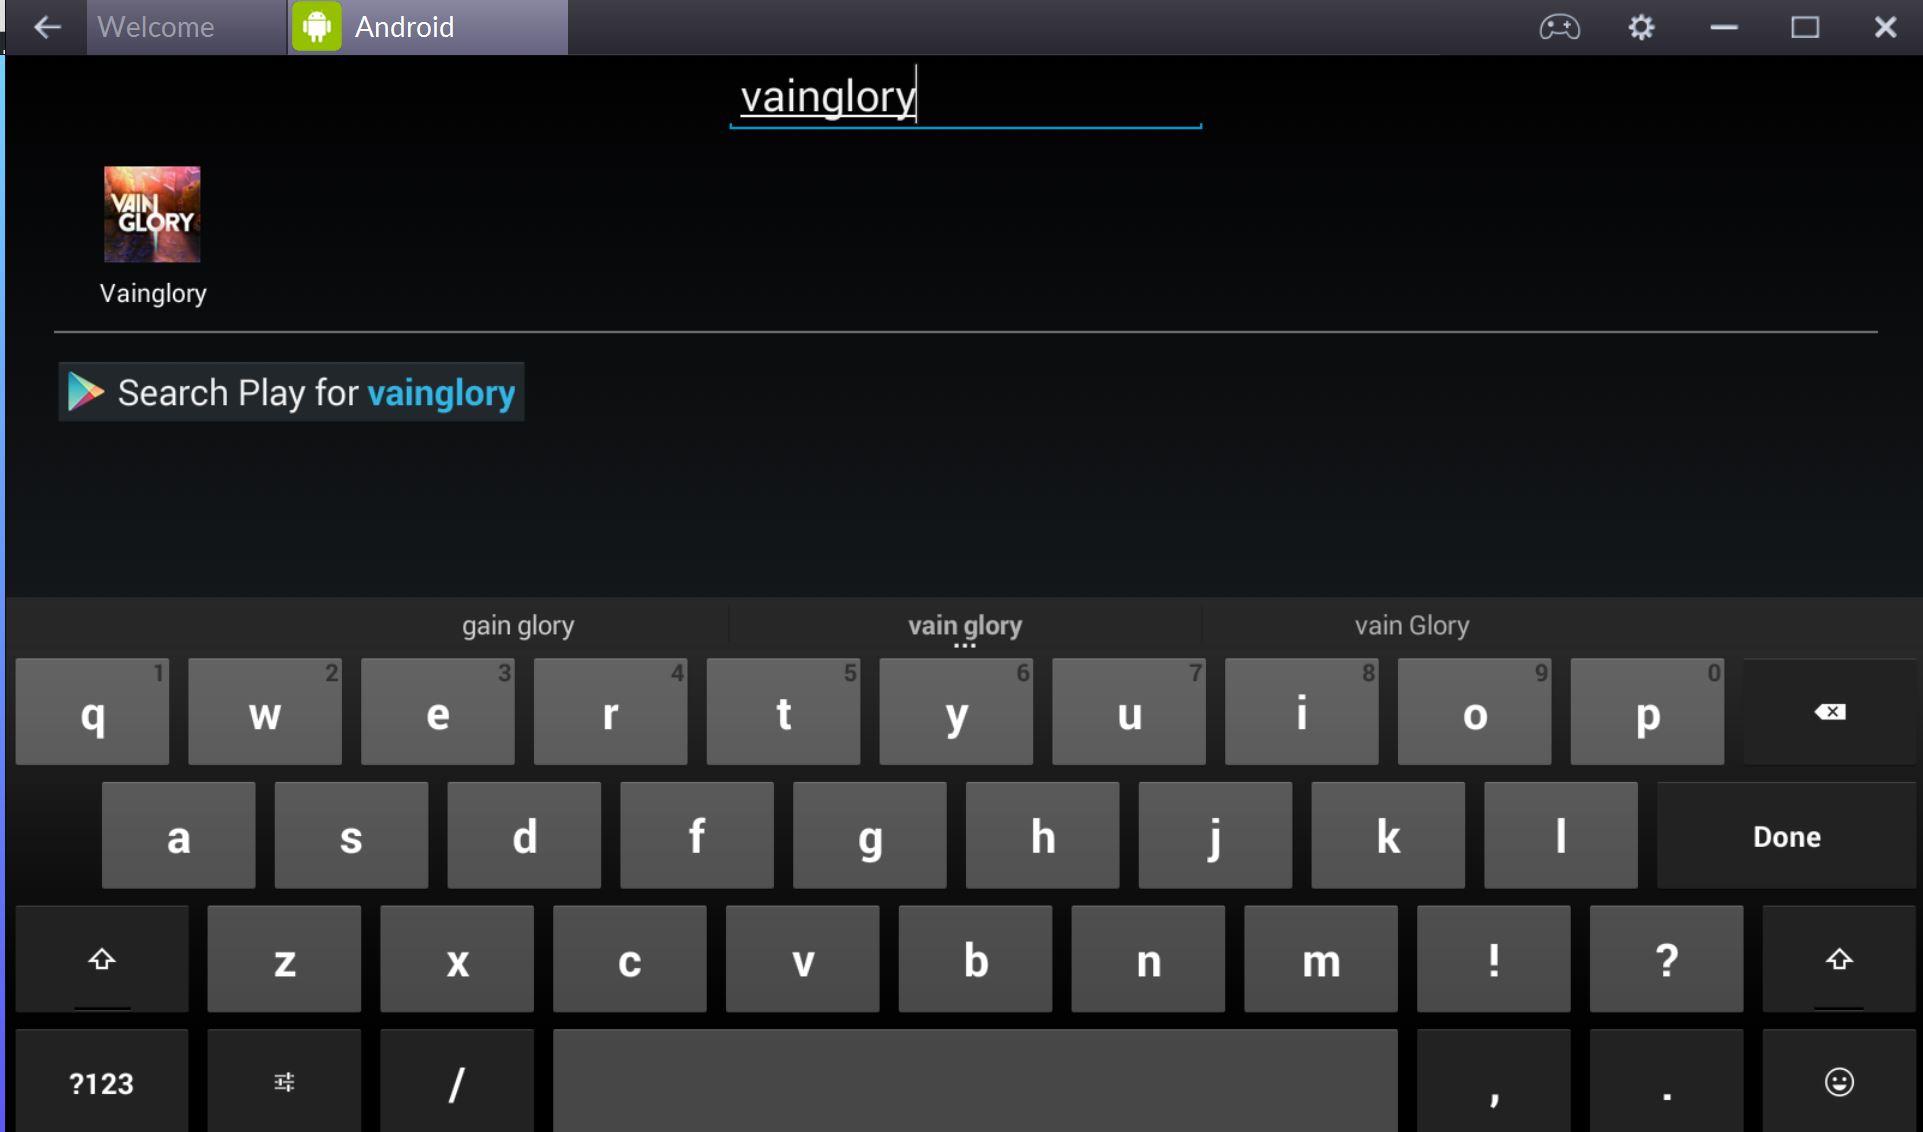 BlueStacks-VainGlory-How-To-2